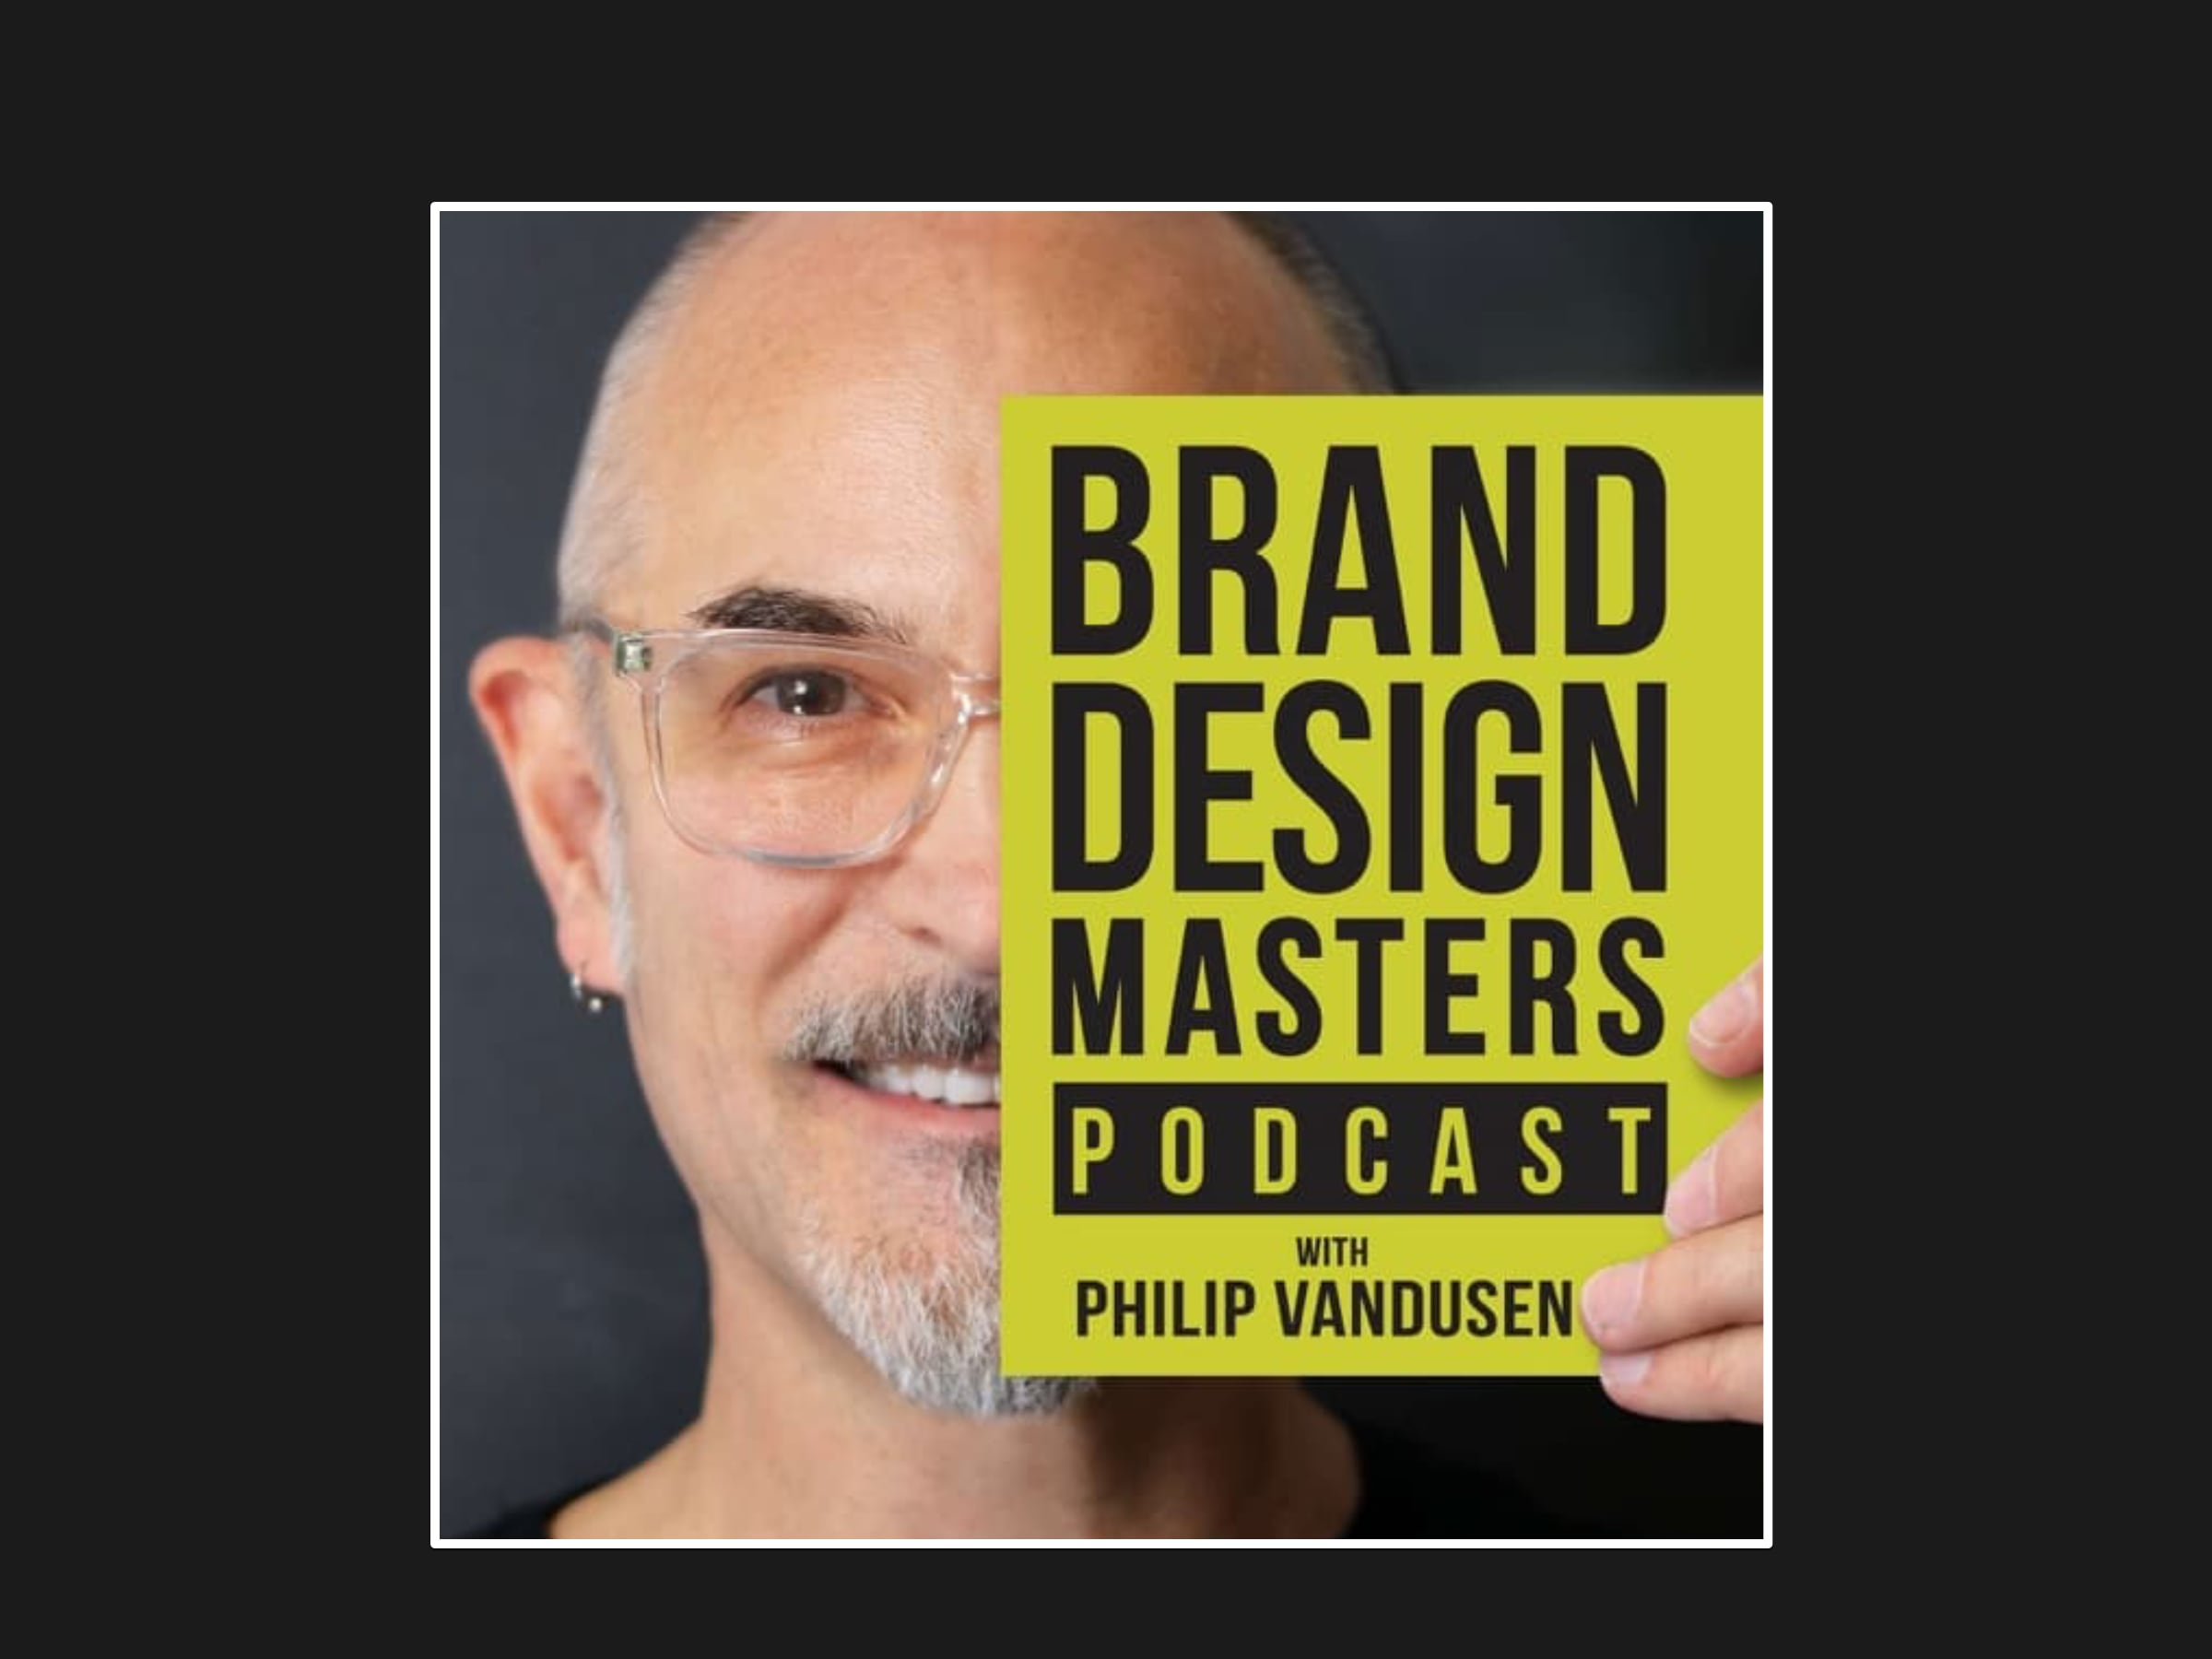 Brand Design Masters podcast artwork